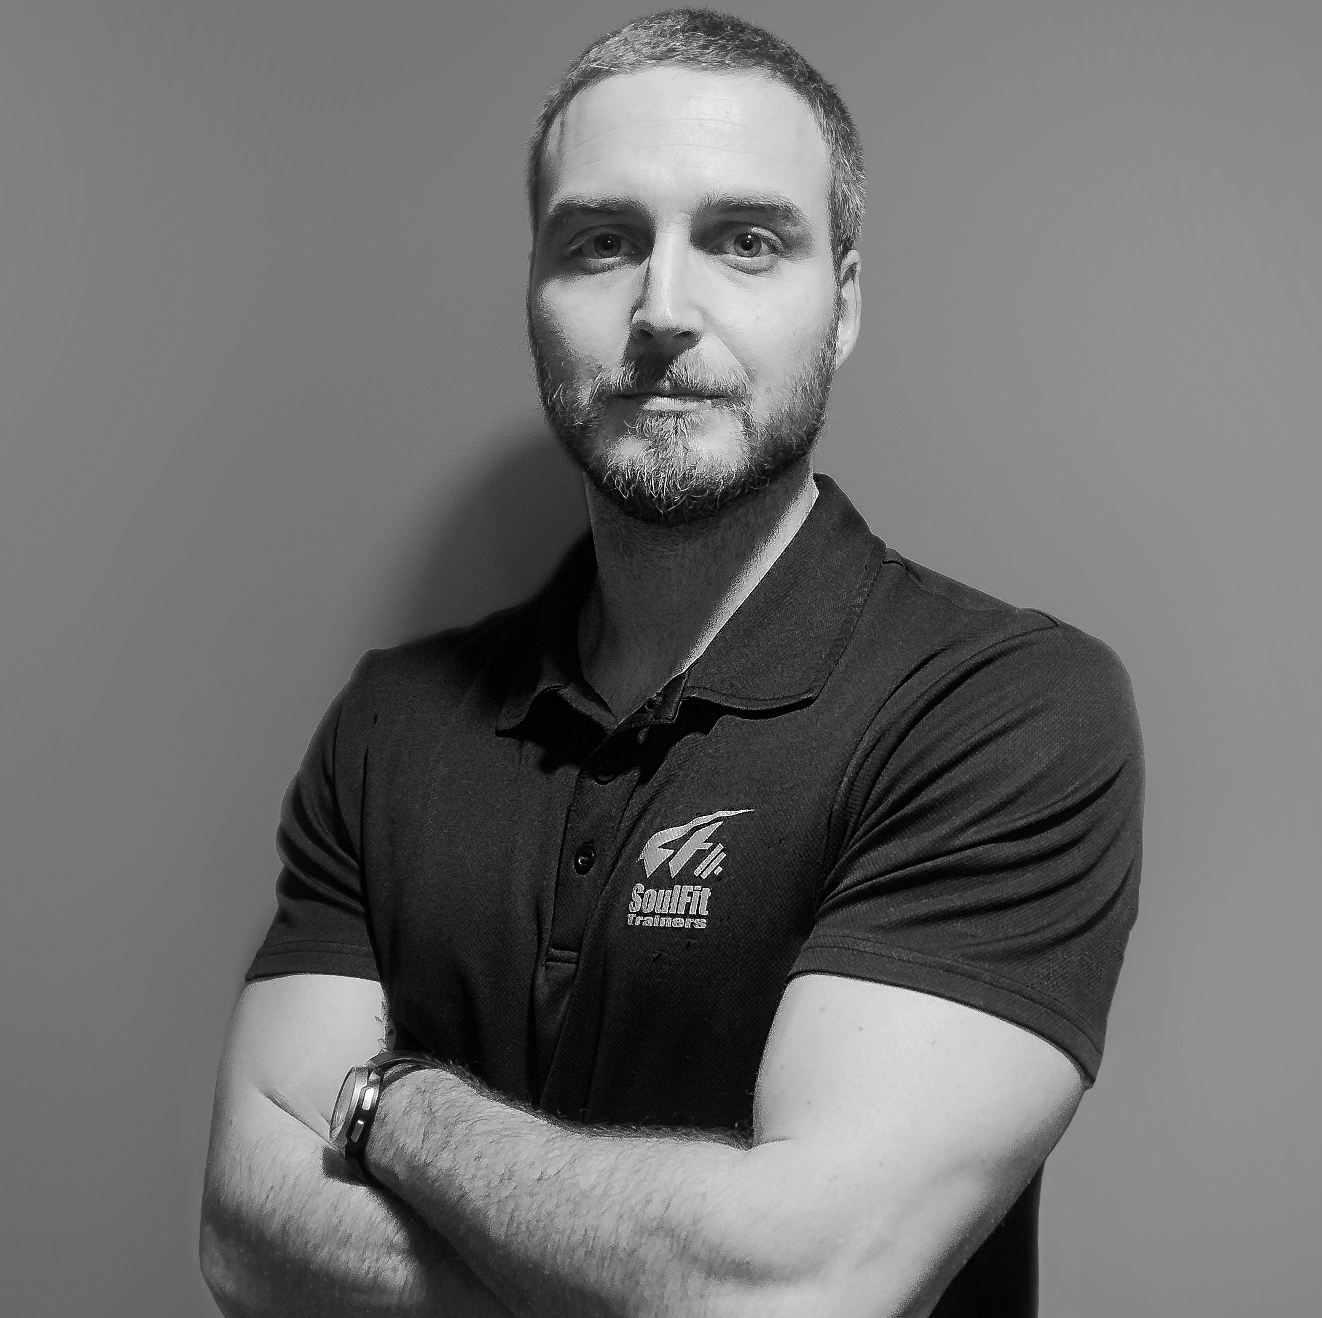 Eduardo personal trainer soulfit